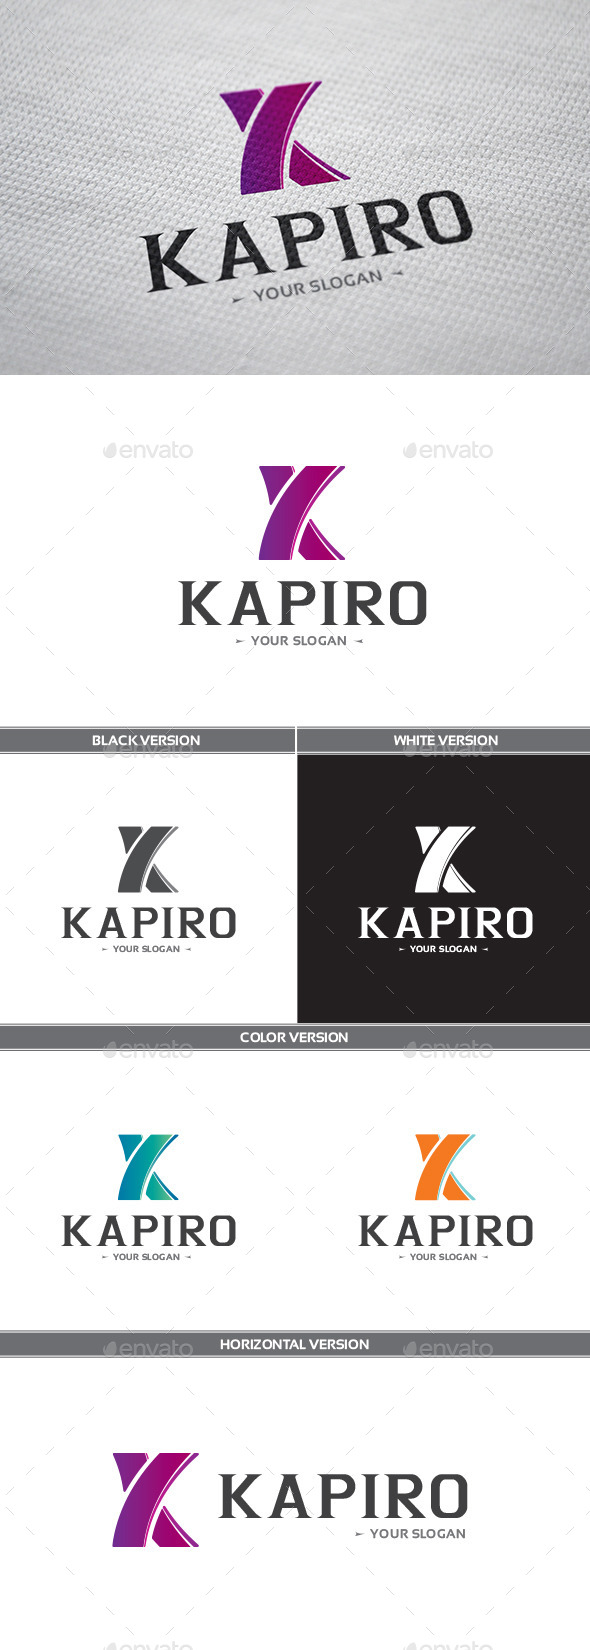 GraphicRiver Kapiro Logo 8838850